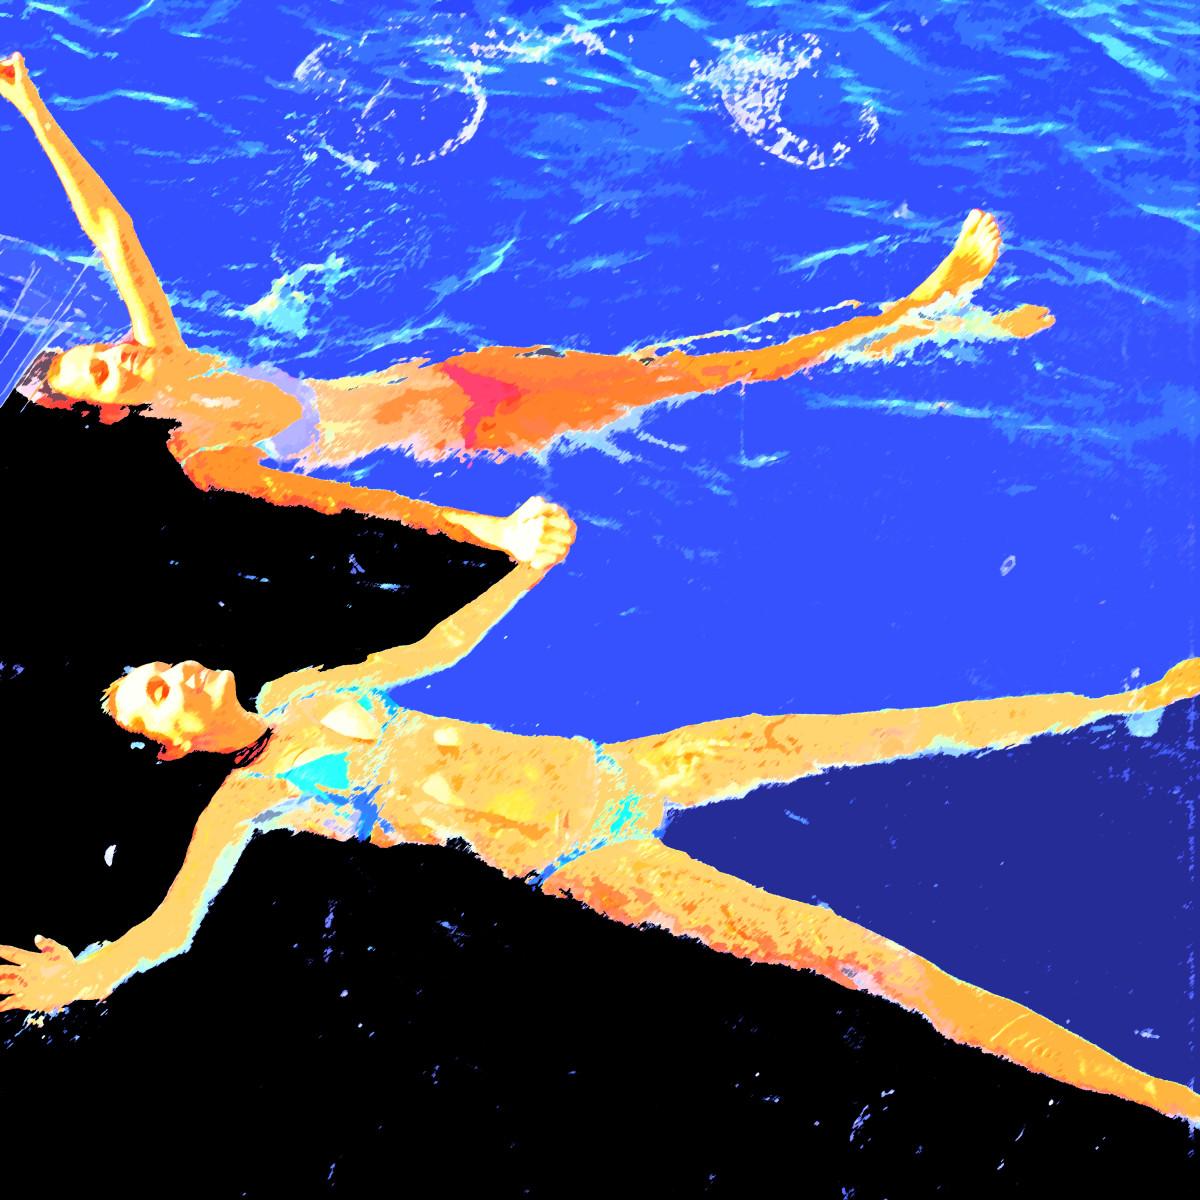 Floating Adrift  by Gina Godfrey